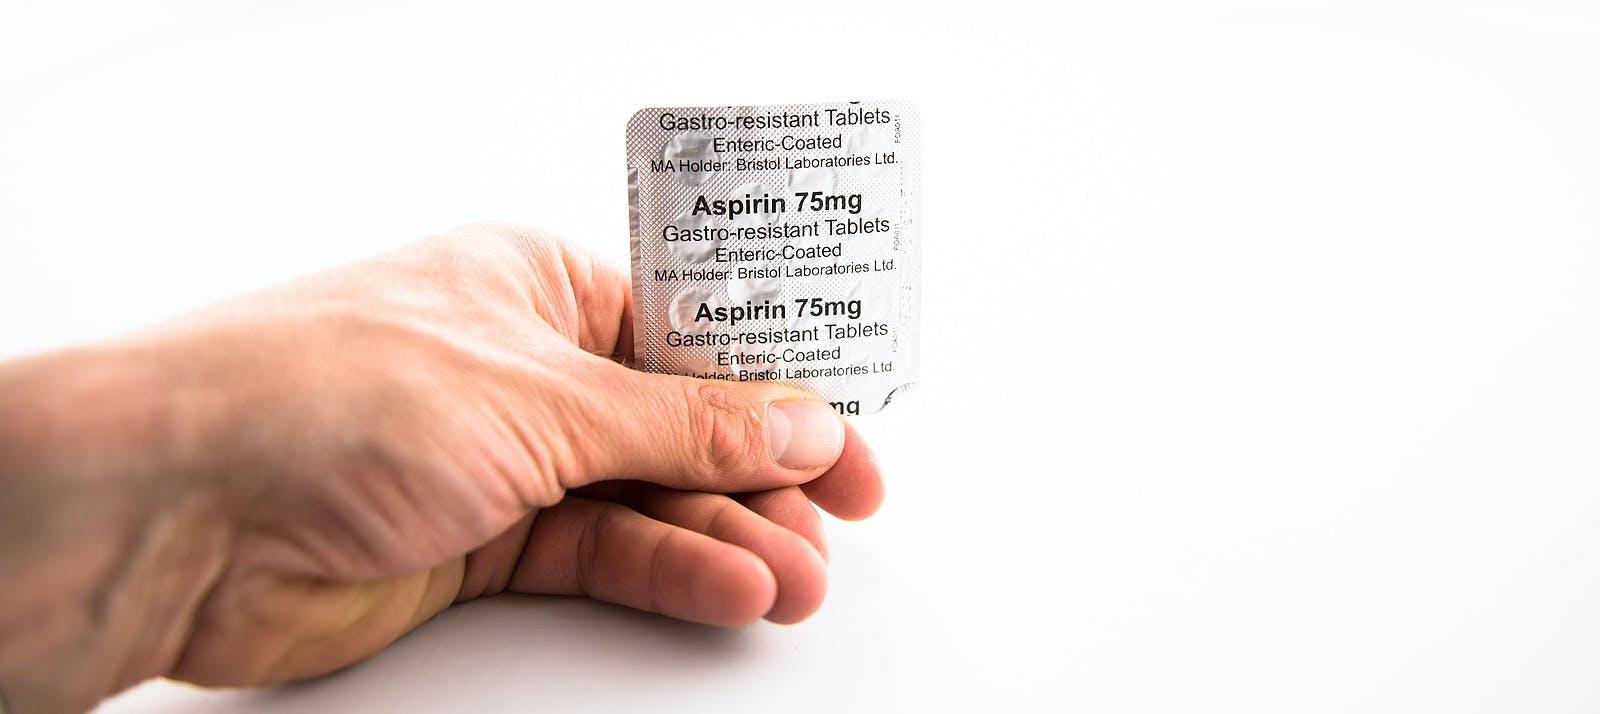 Alloa, Scotland – 13 August 2019: Aspirin 75 mg gastro-resistant tablets